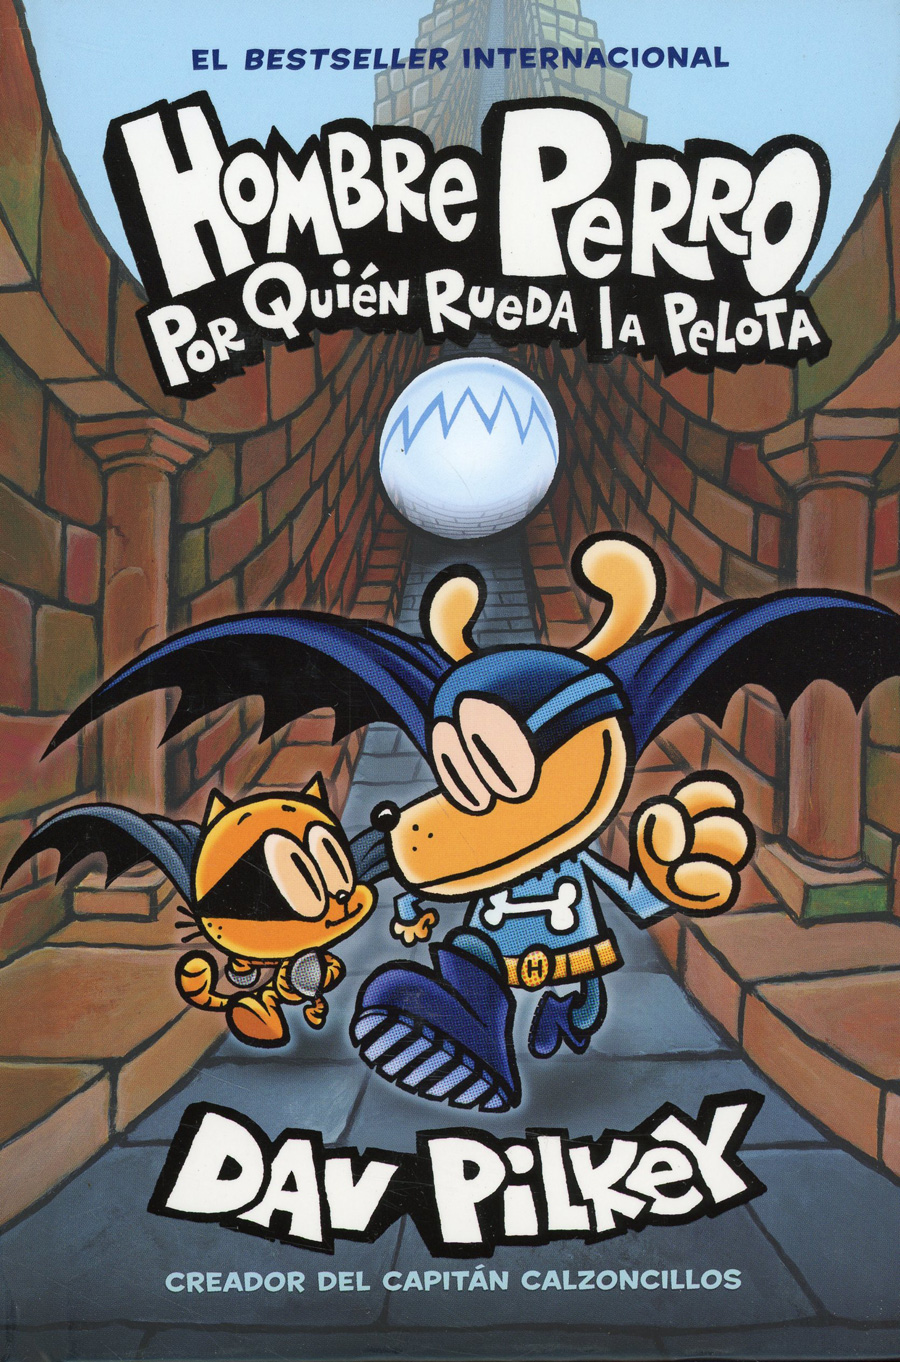 Hombre Perro Por Quien Rueda La Pelota (Dog Man Vol 7 For Whom The Ball Rolls Spanish Edition) HC